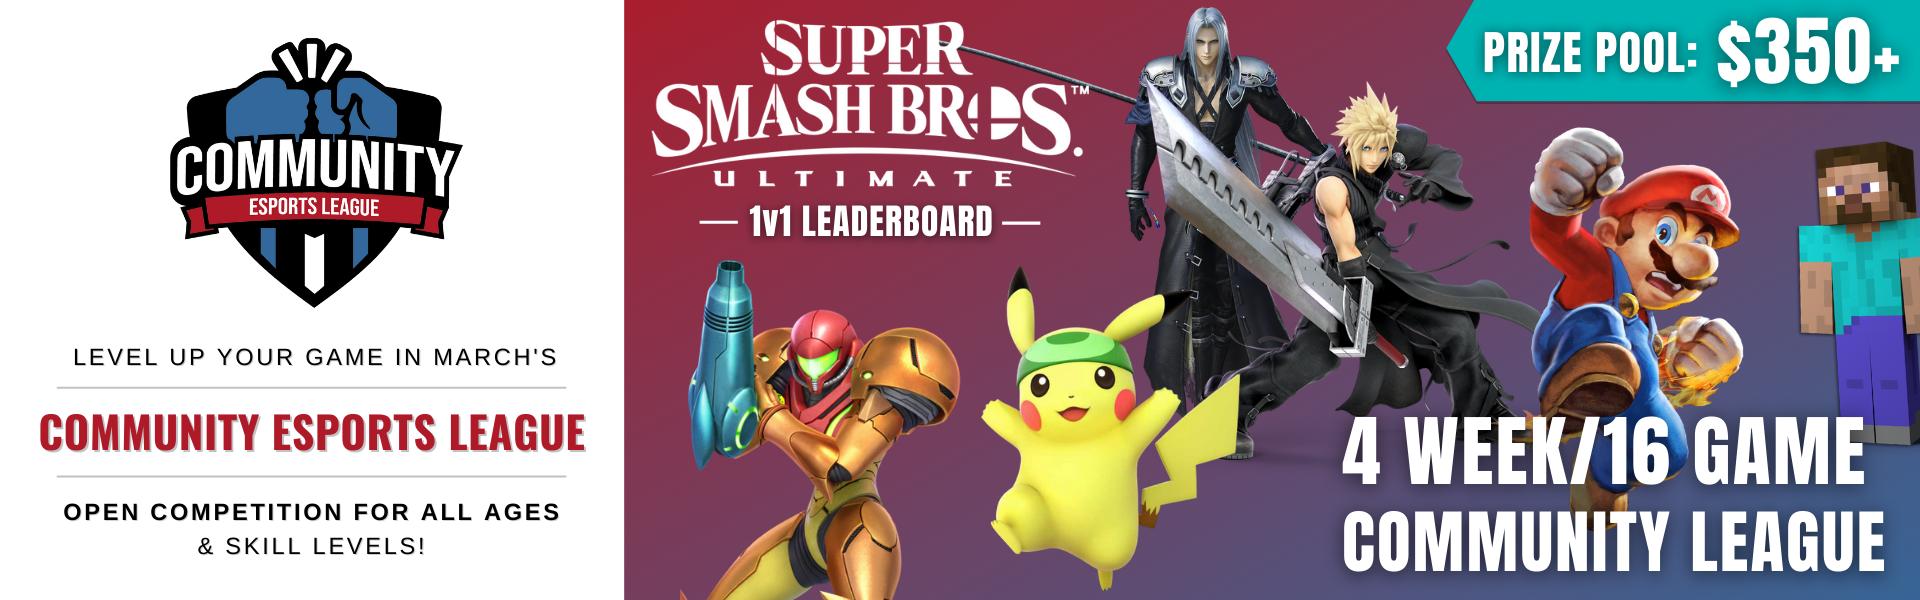 Super Smash Bros. Ultimate: March